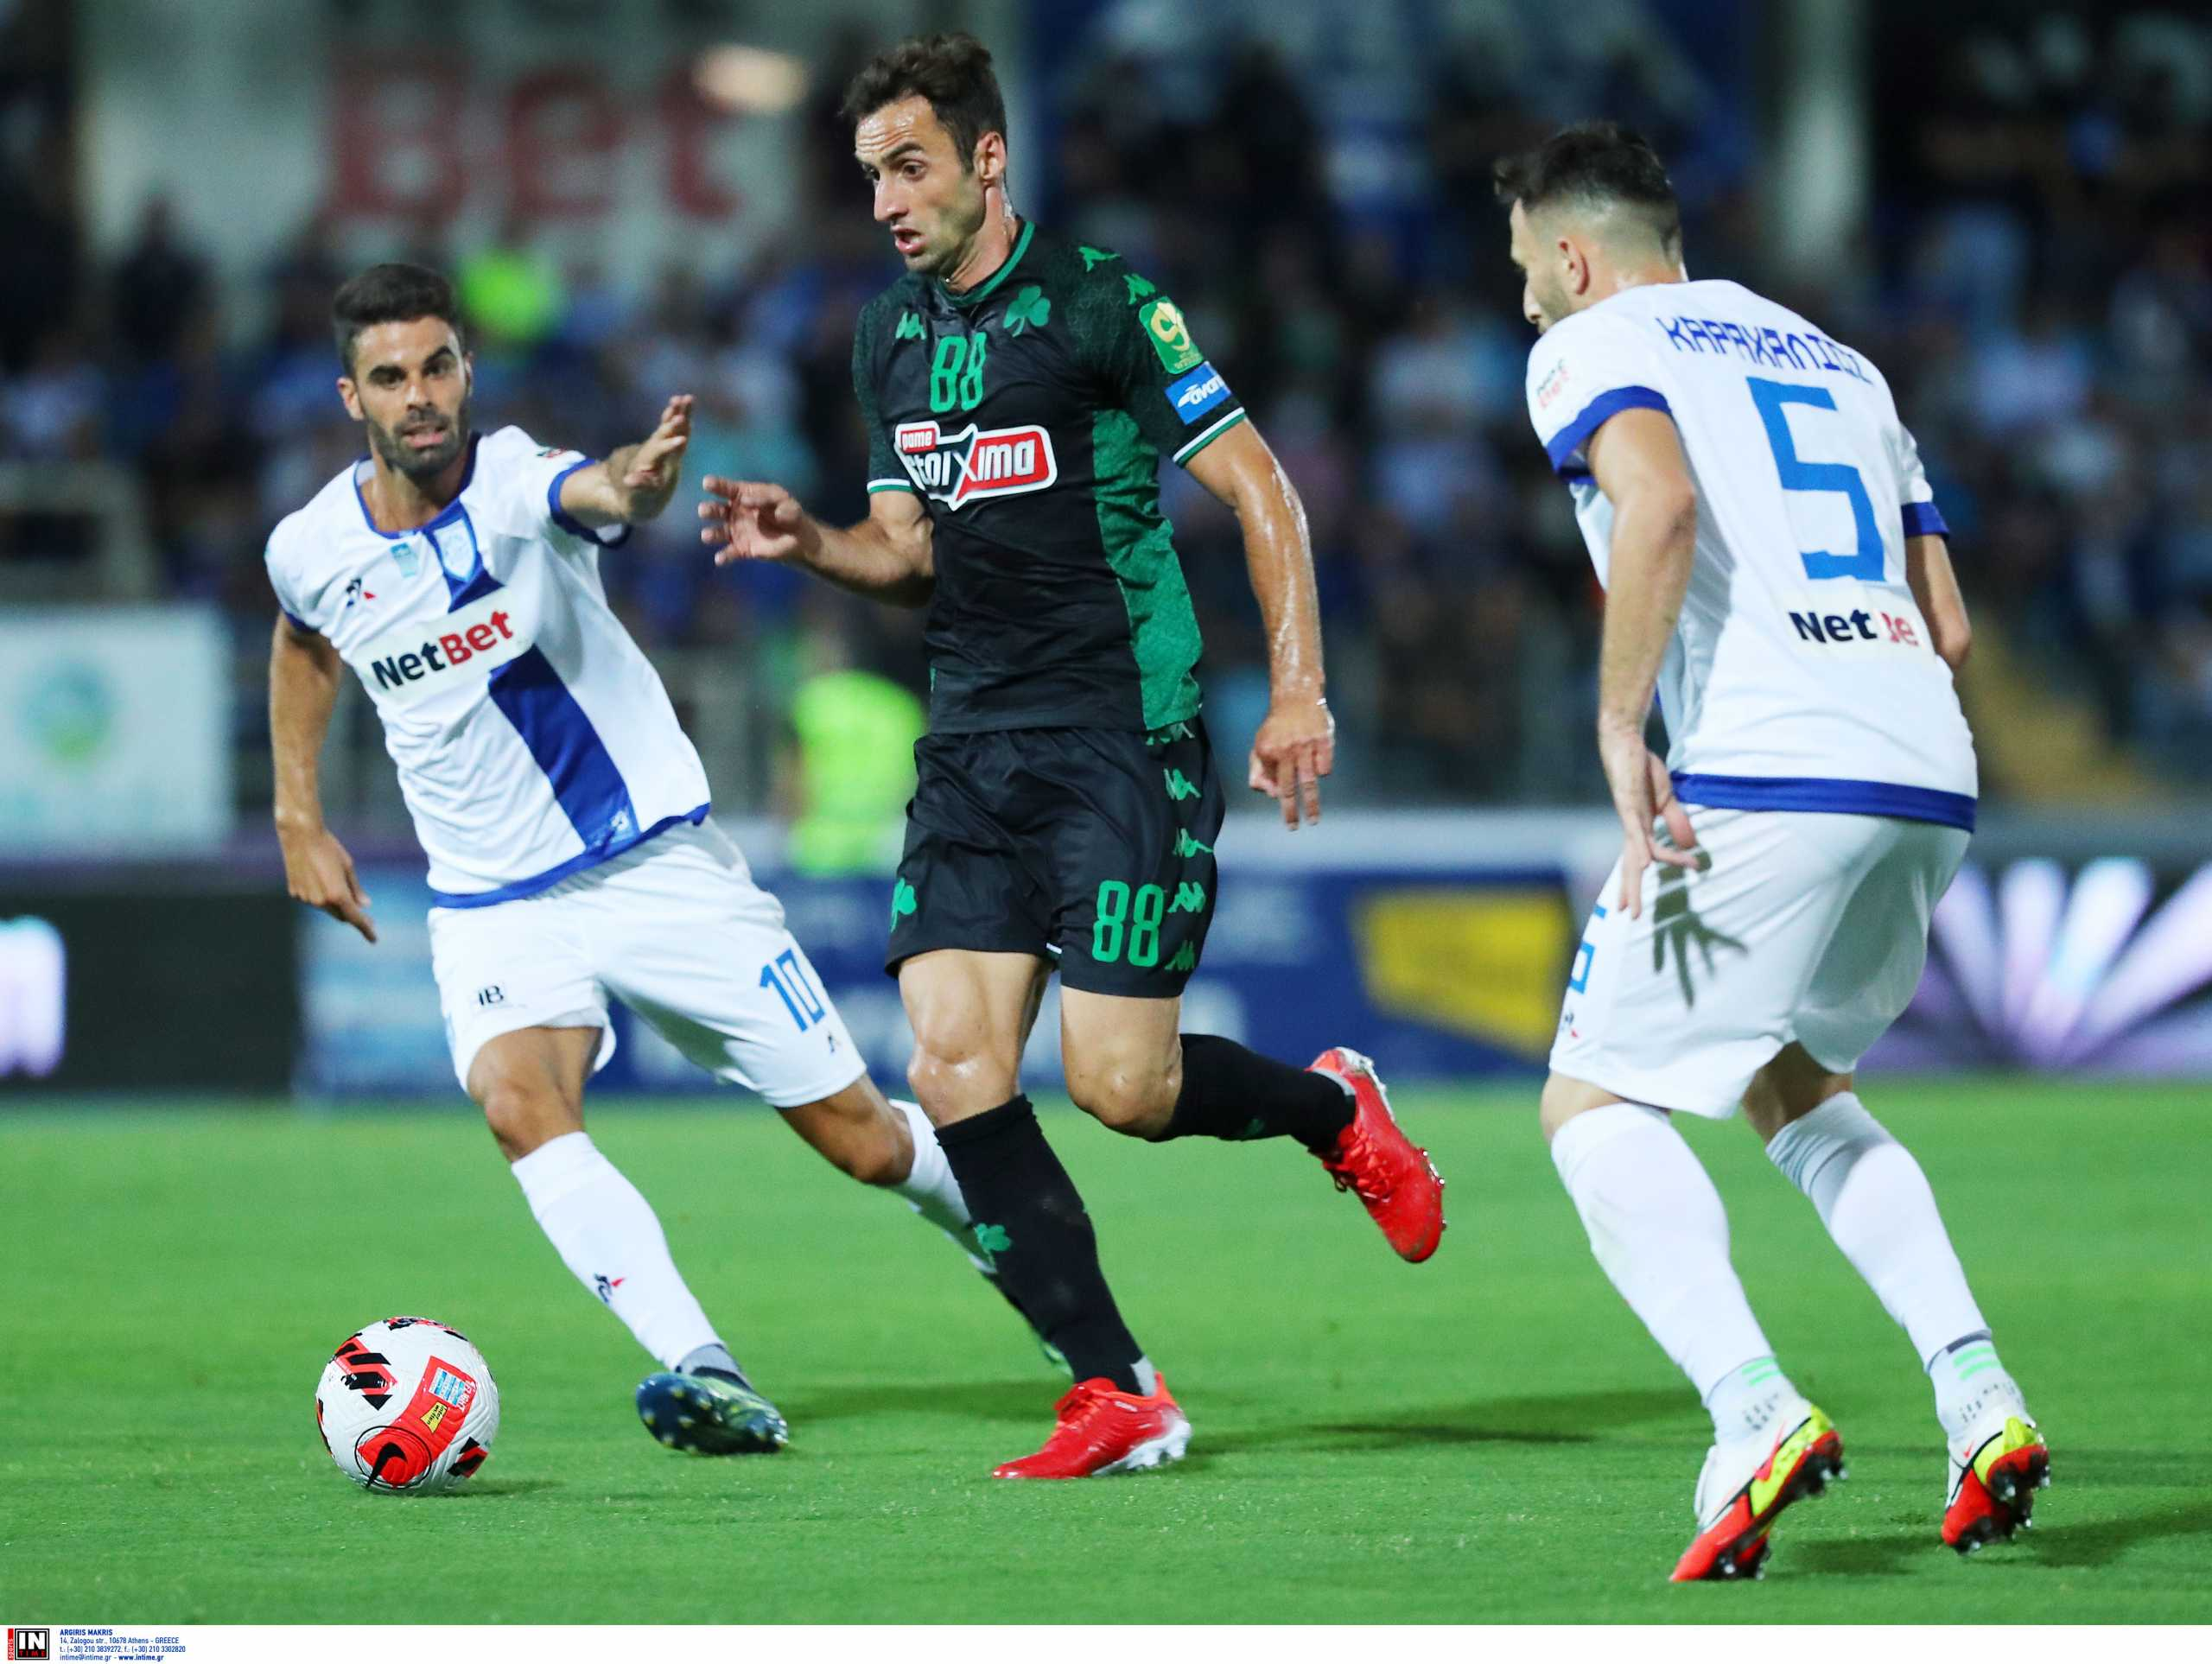 Super League 1, ΠΑΣ Γιάννινα – Παναθηναϊκός 1-0: Τα highlights του αγώνα στους «Zωσιμάδες»